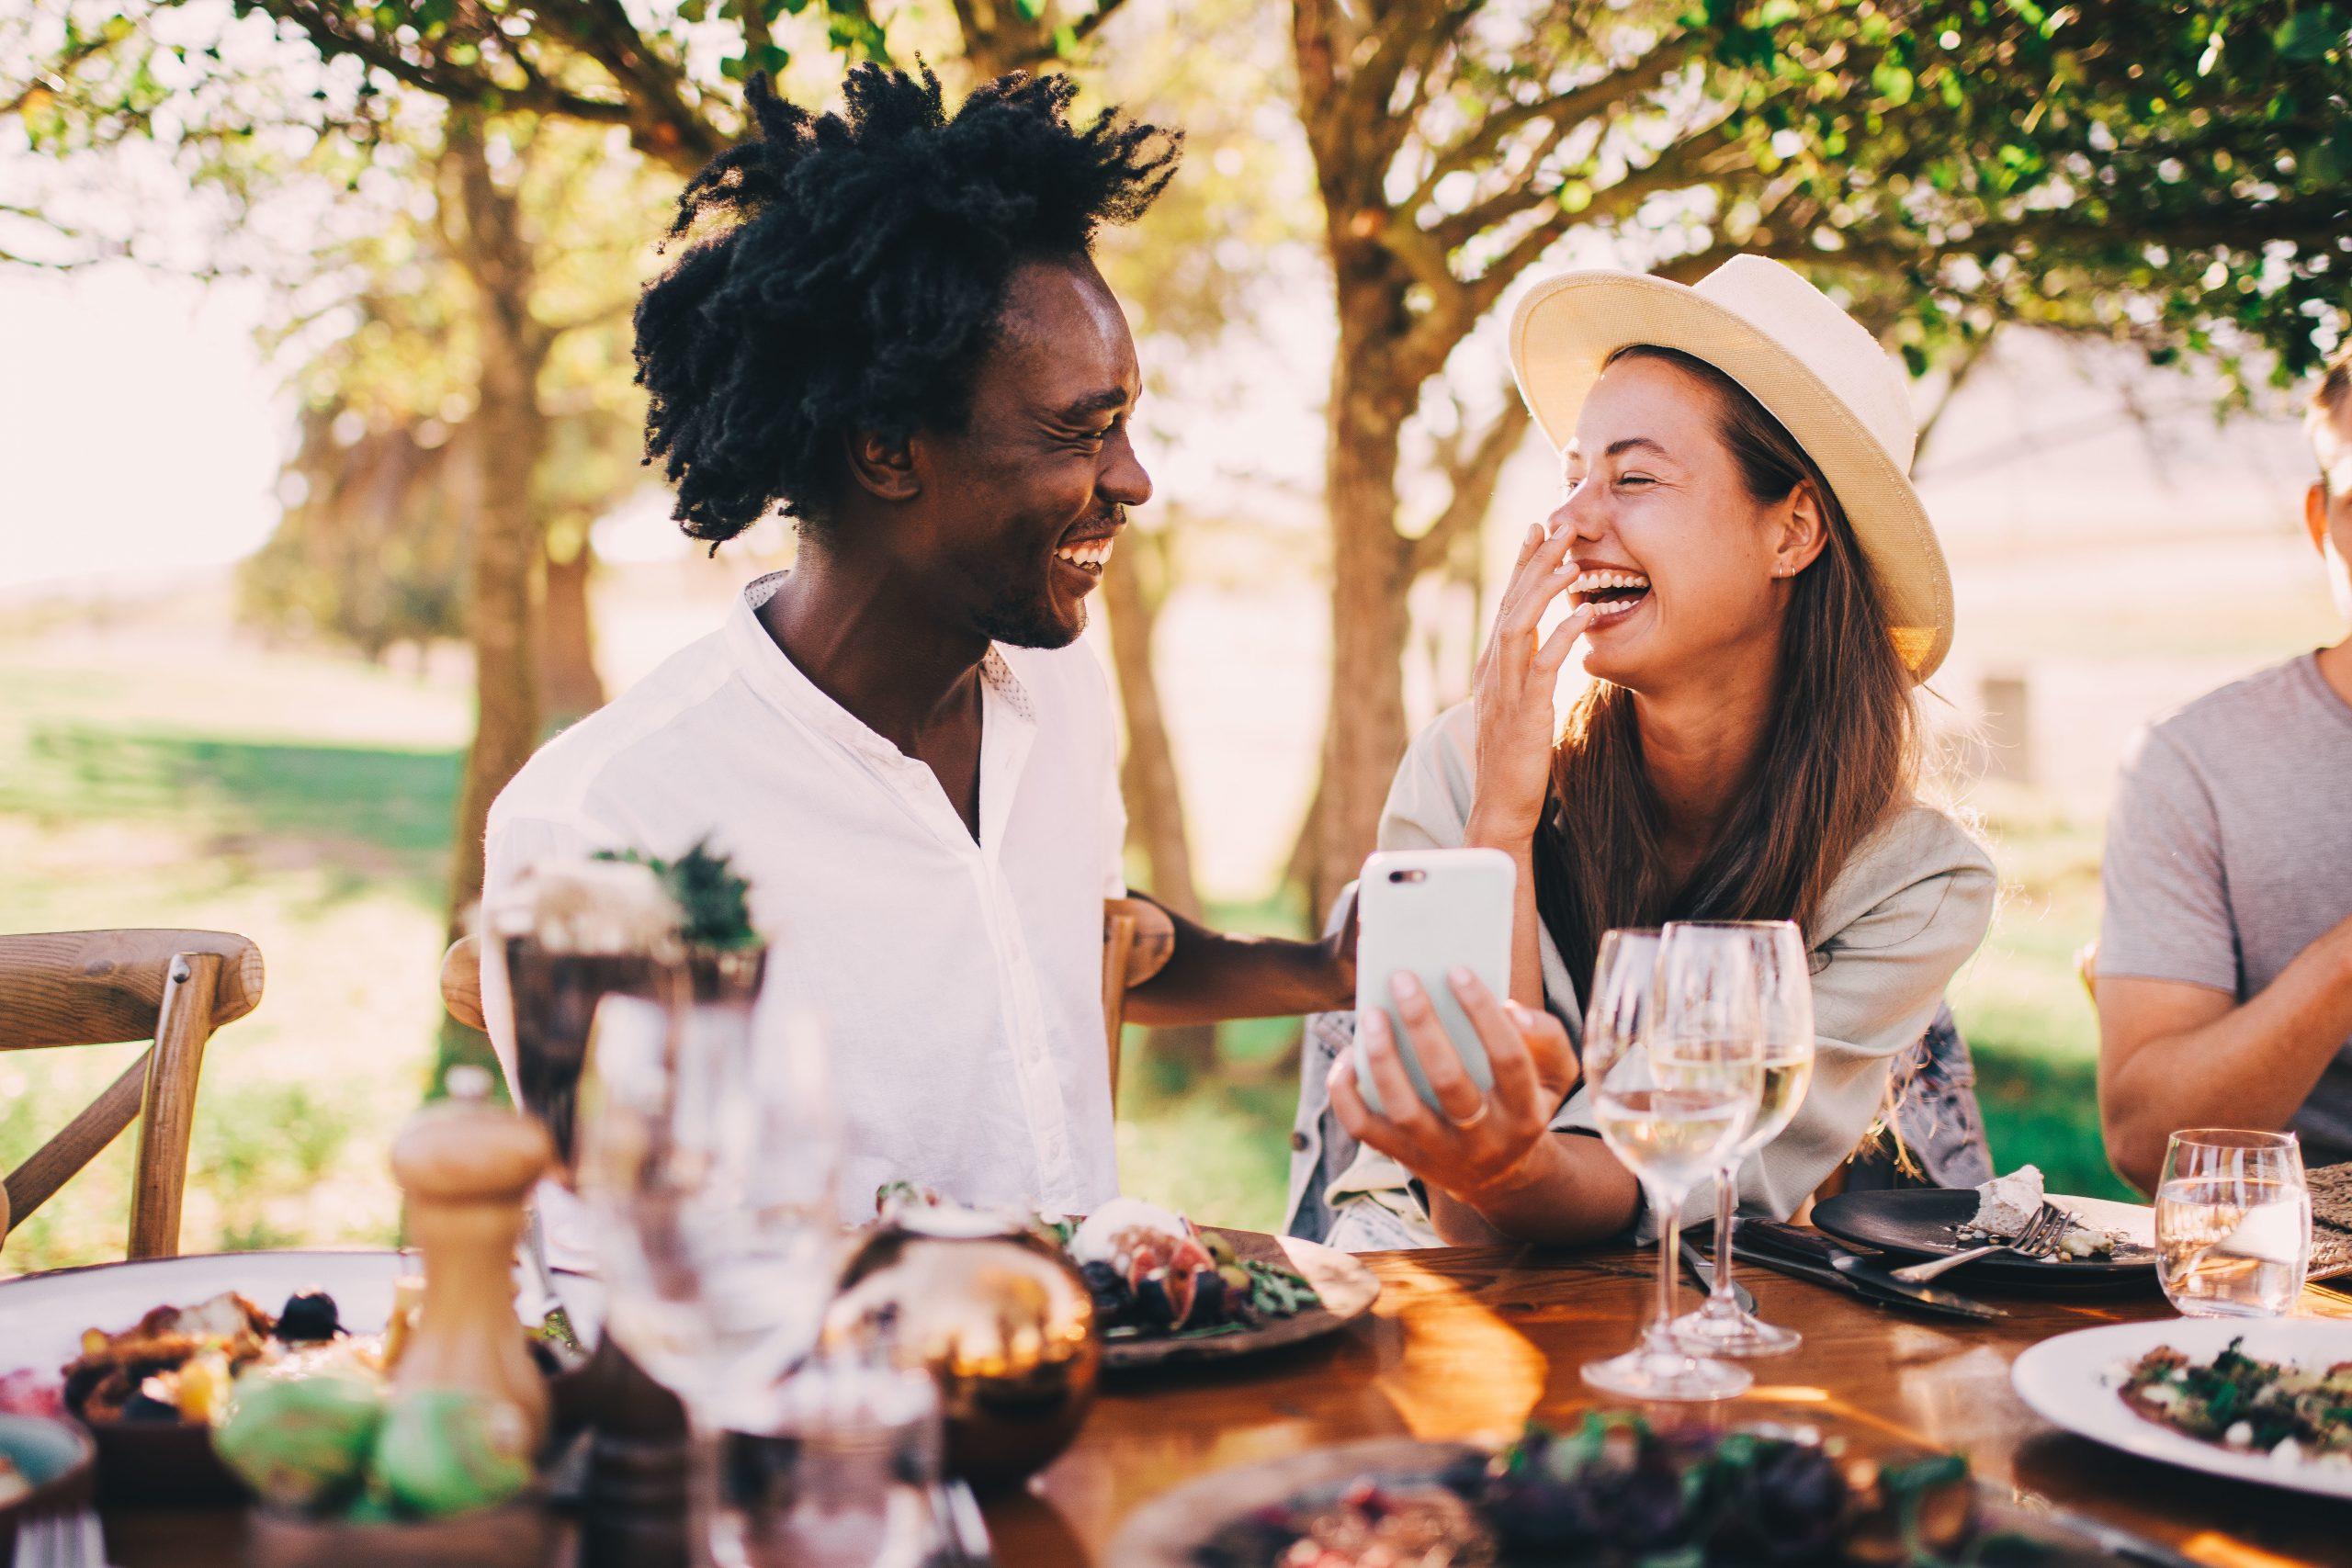 couple having a picnic having fun